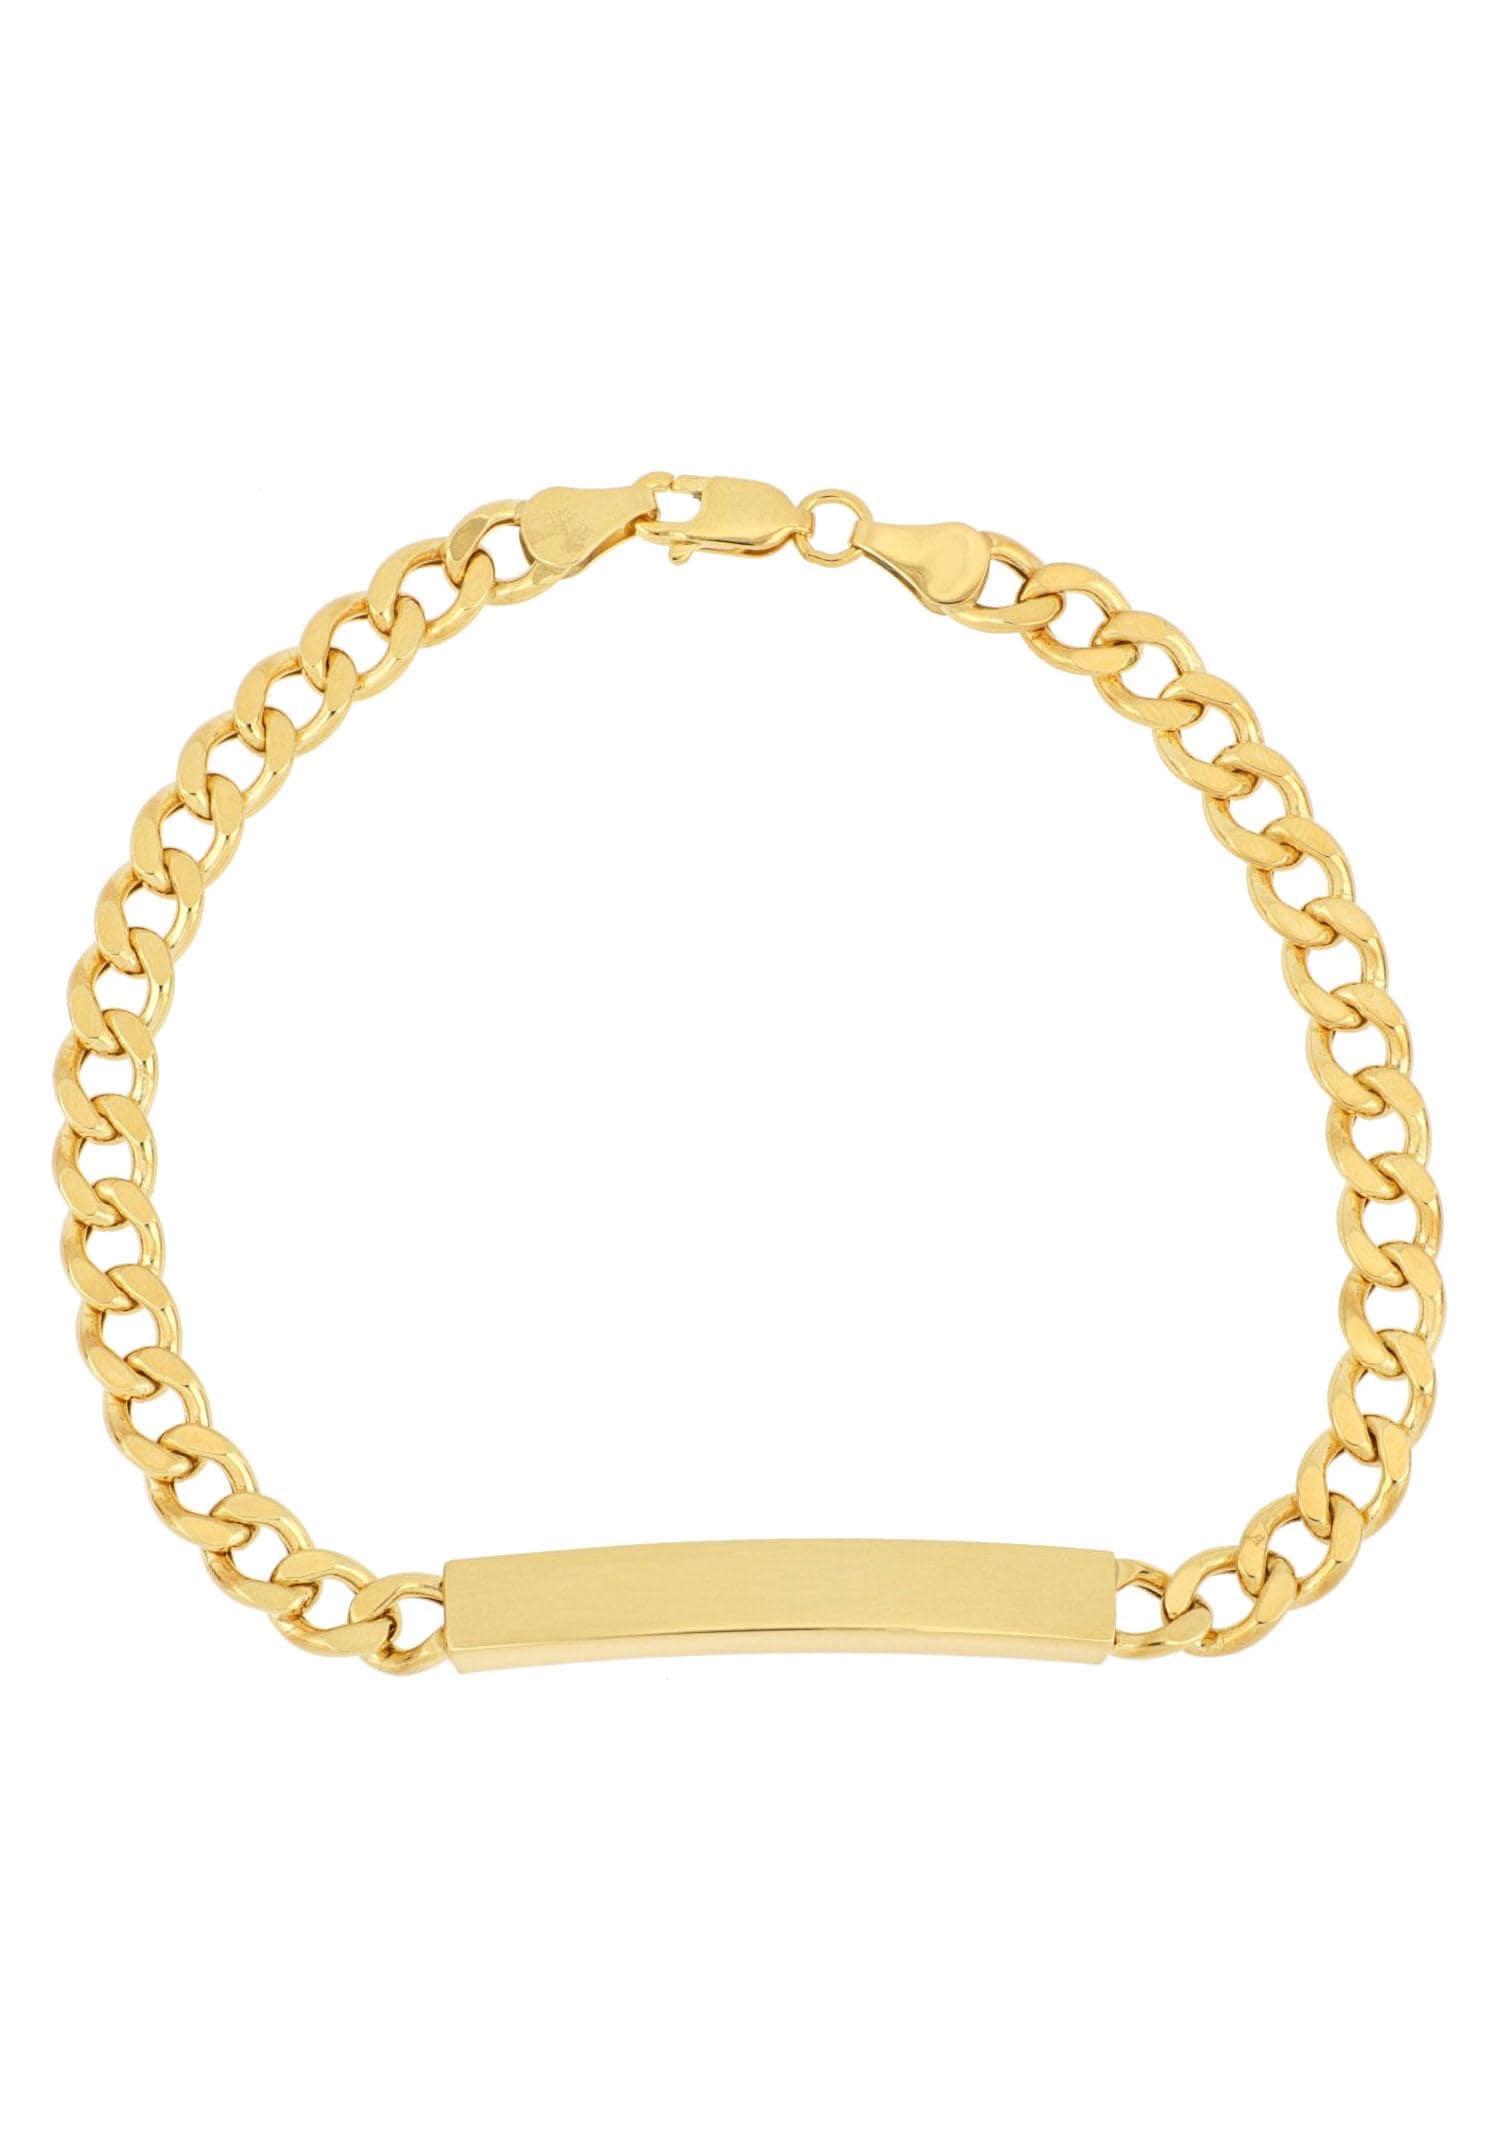 Firetti ID Armband »Gravurplatte, 2-fach diamantiert, poliert, mit Gratisgravur« | Schmuck > Armbänder > Armbänder mit Gravur | Goldfarben | Massiv | FIRETTI